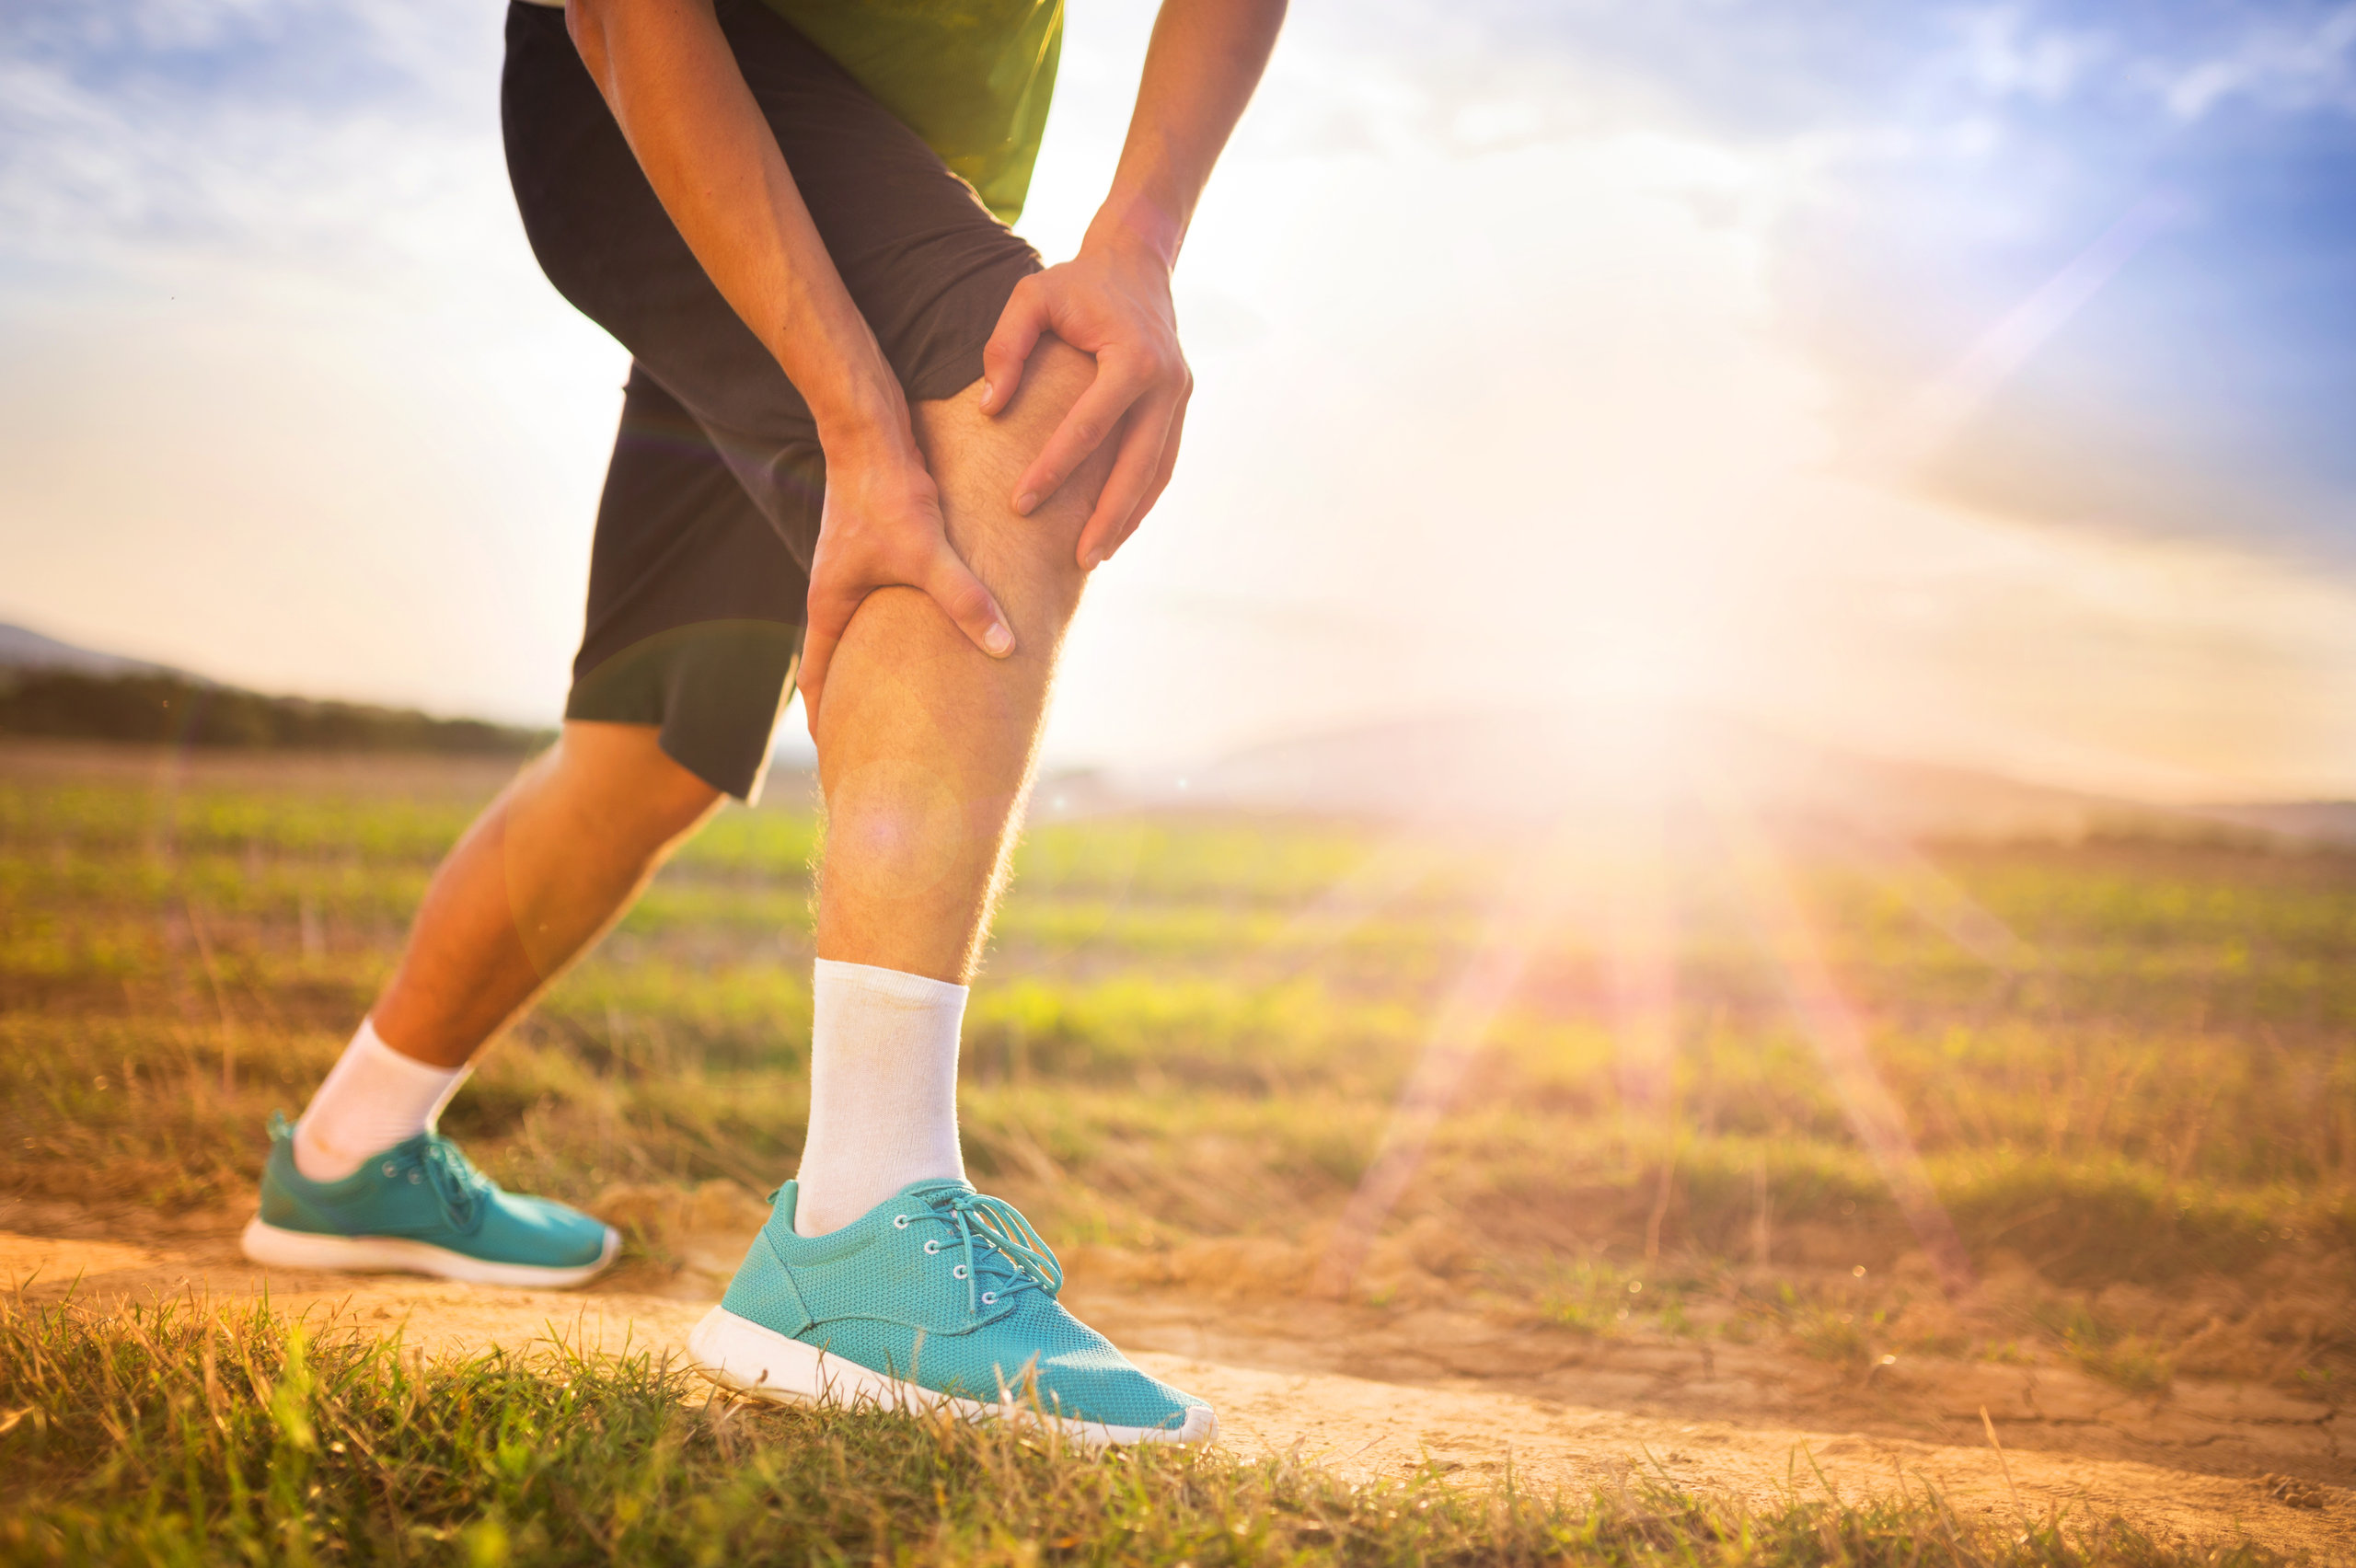 Sprains, Arthritis & Tendonitis